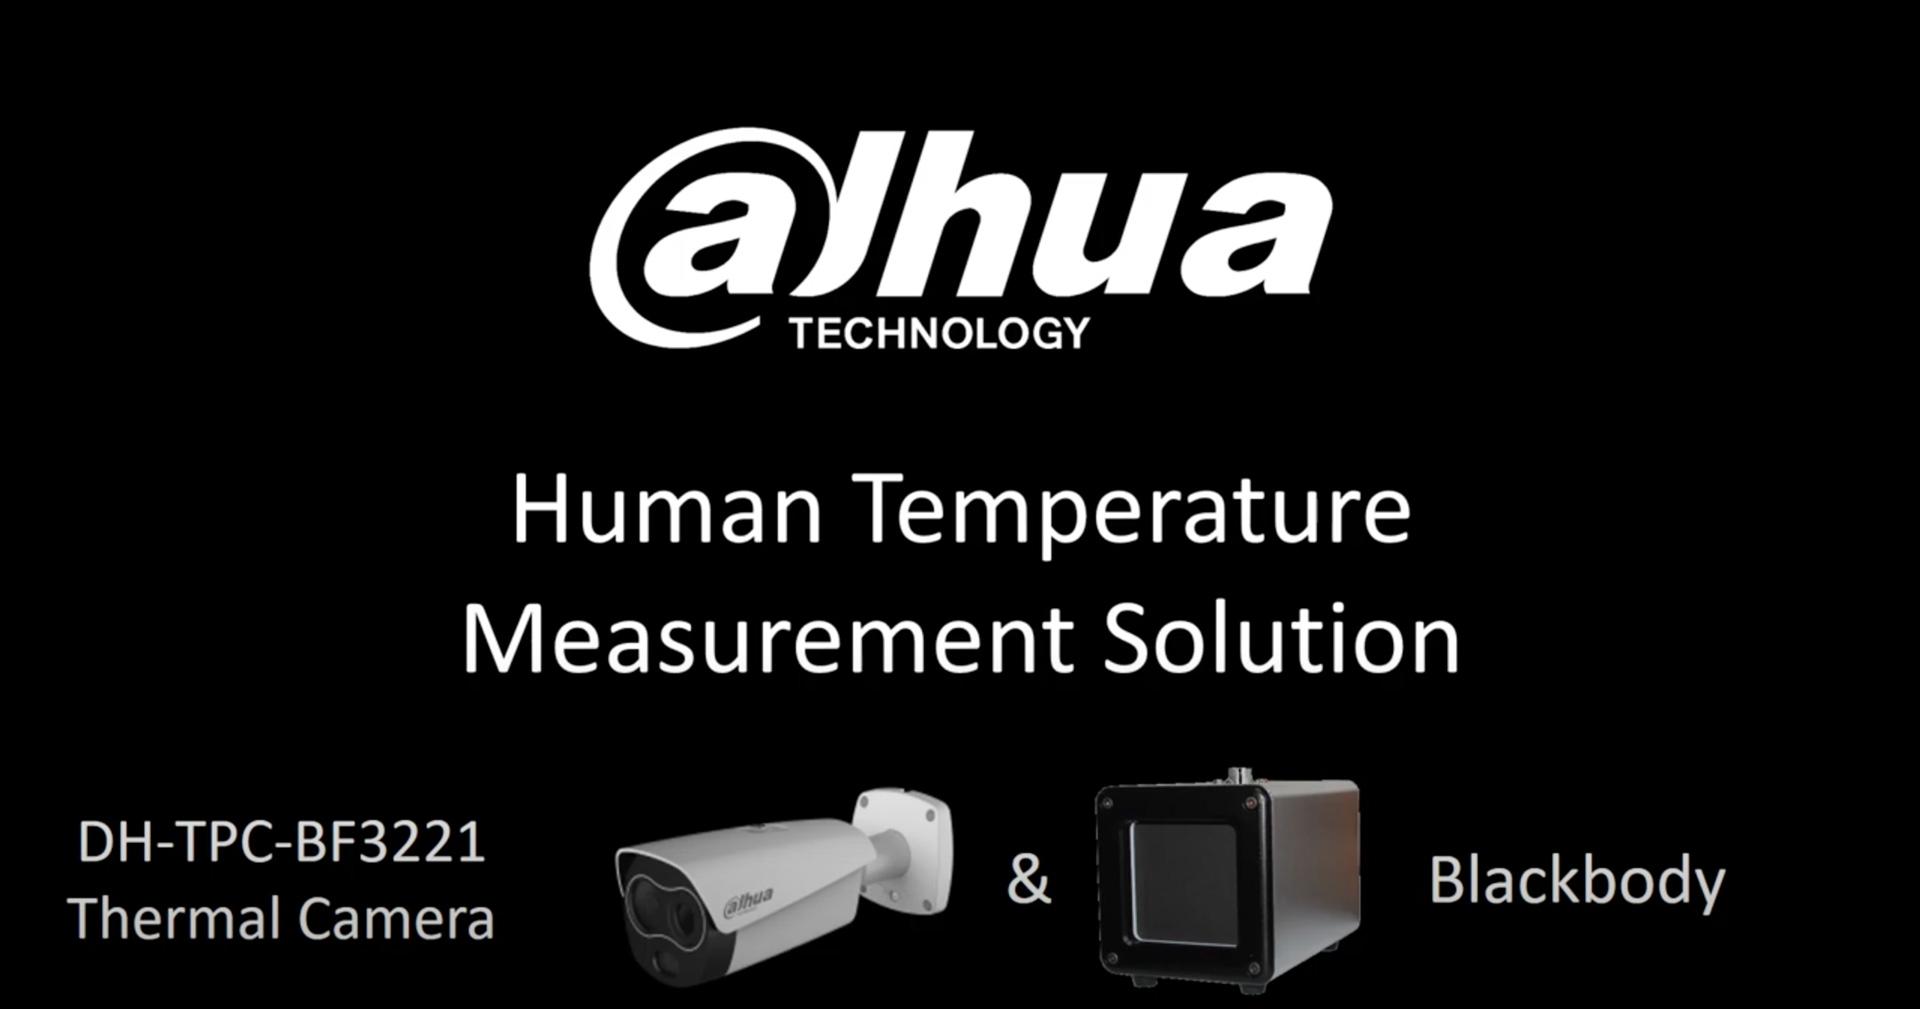 Human Temperature Measurement Solution